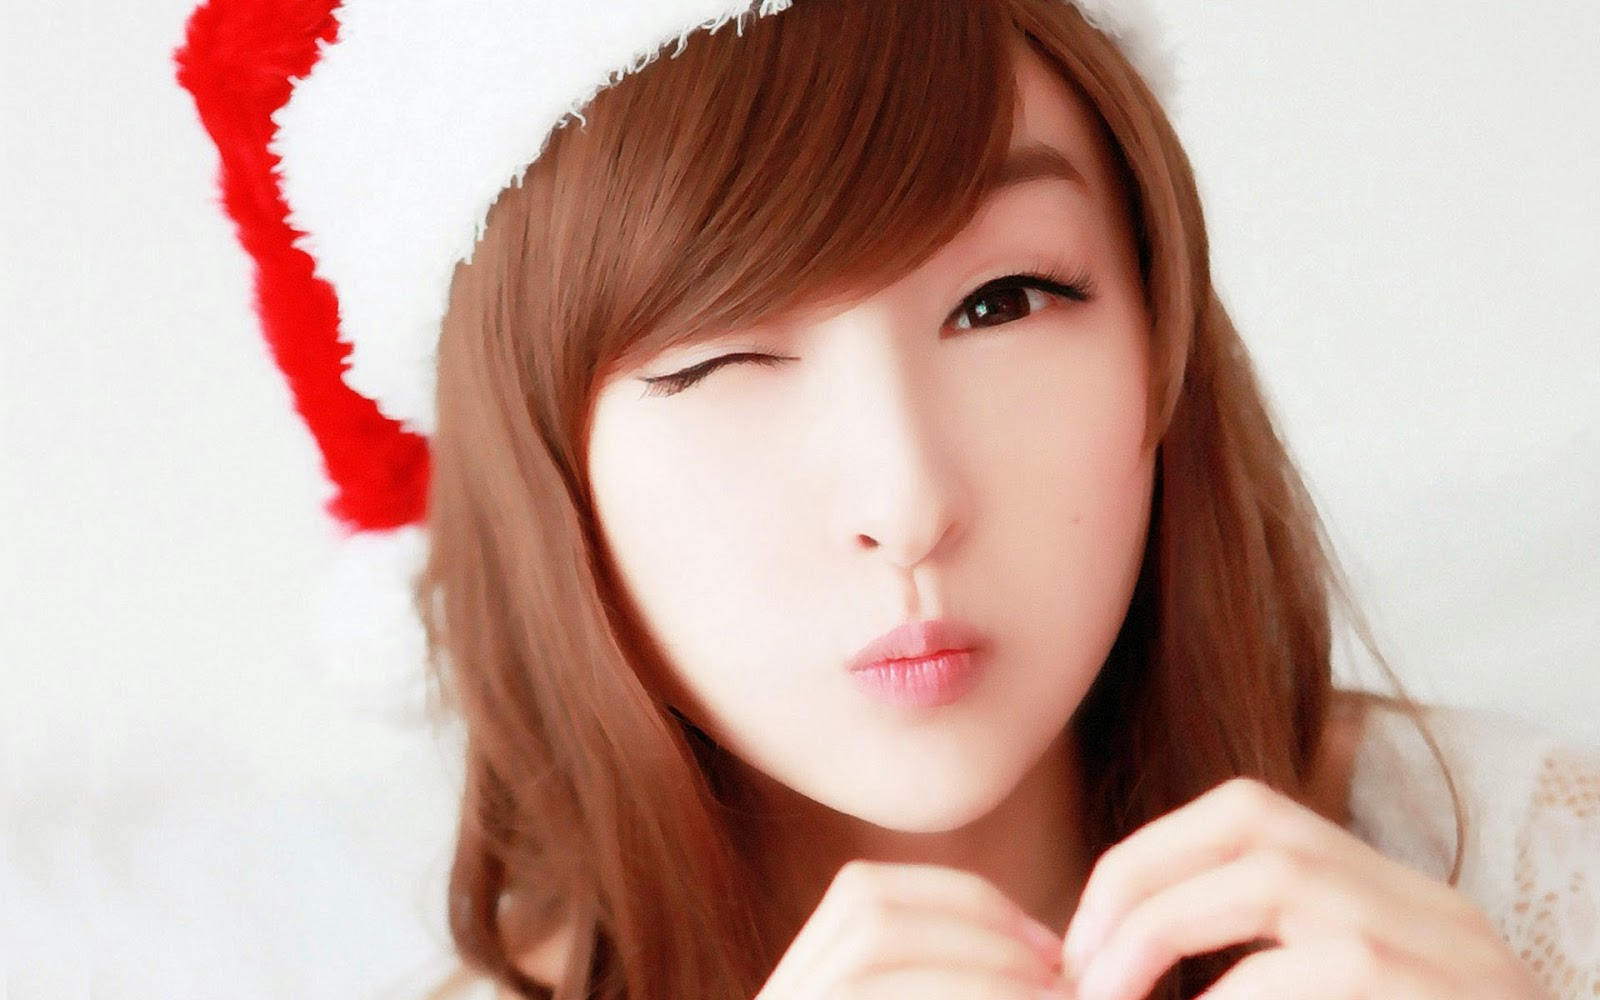 Cute Christmas Whatsapp Dp For Girl Pic Hwb38019 - Lin Ketong , HD Wallpaper & Backgrounds